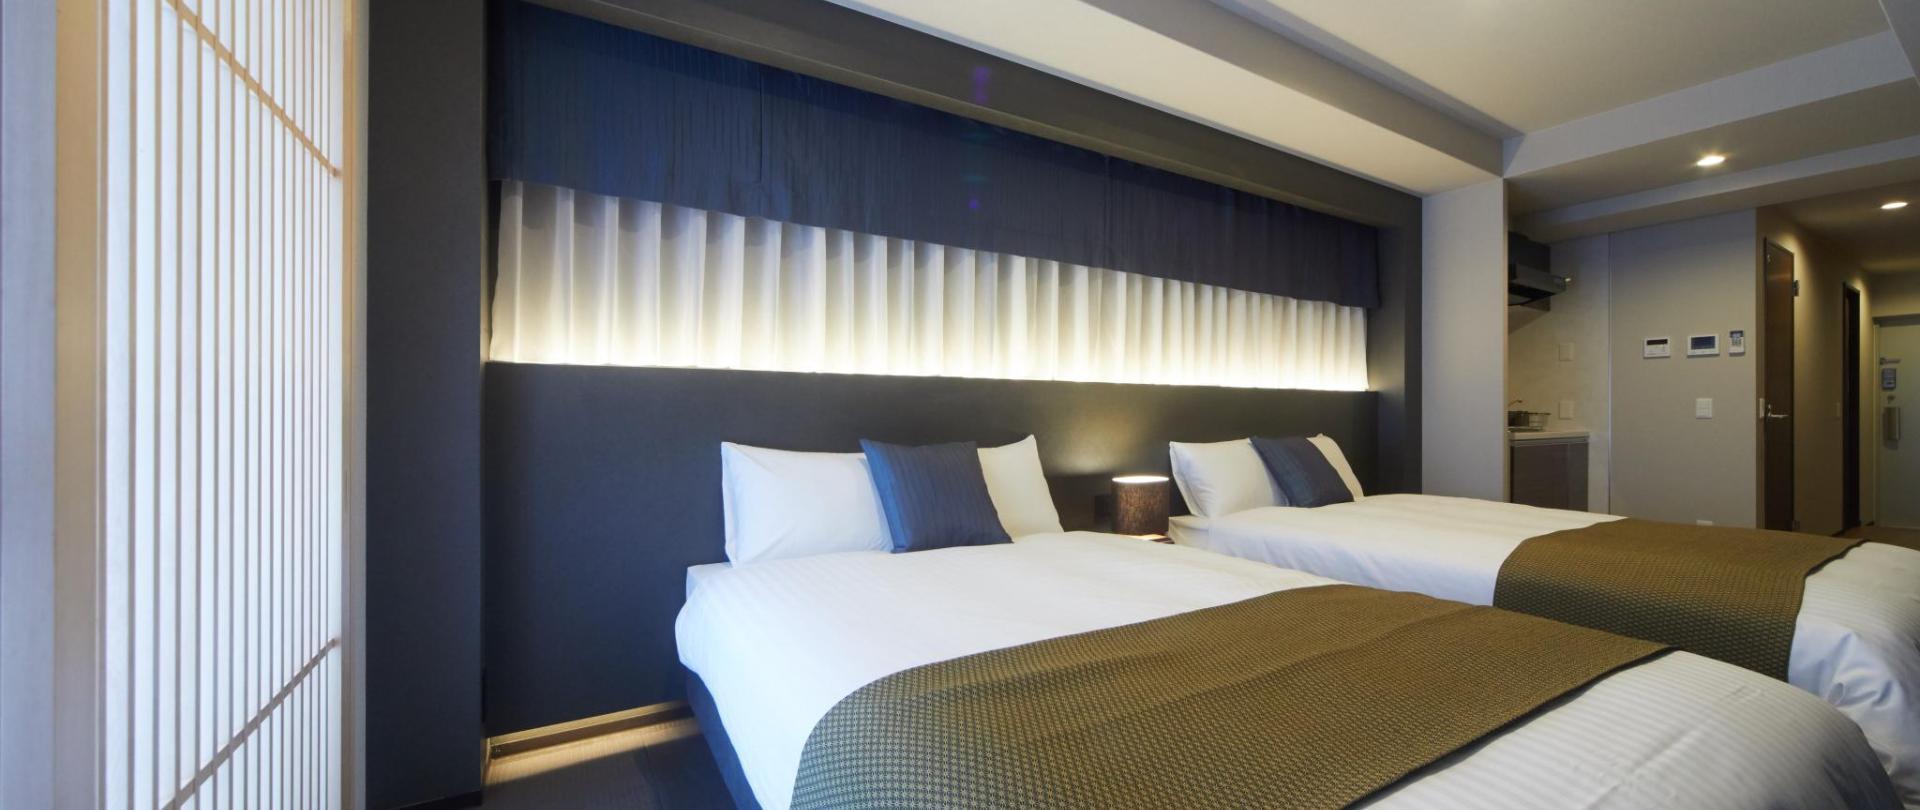 181217_HotelMondonce_143.jpg